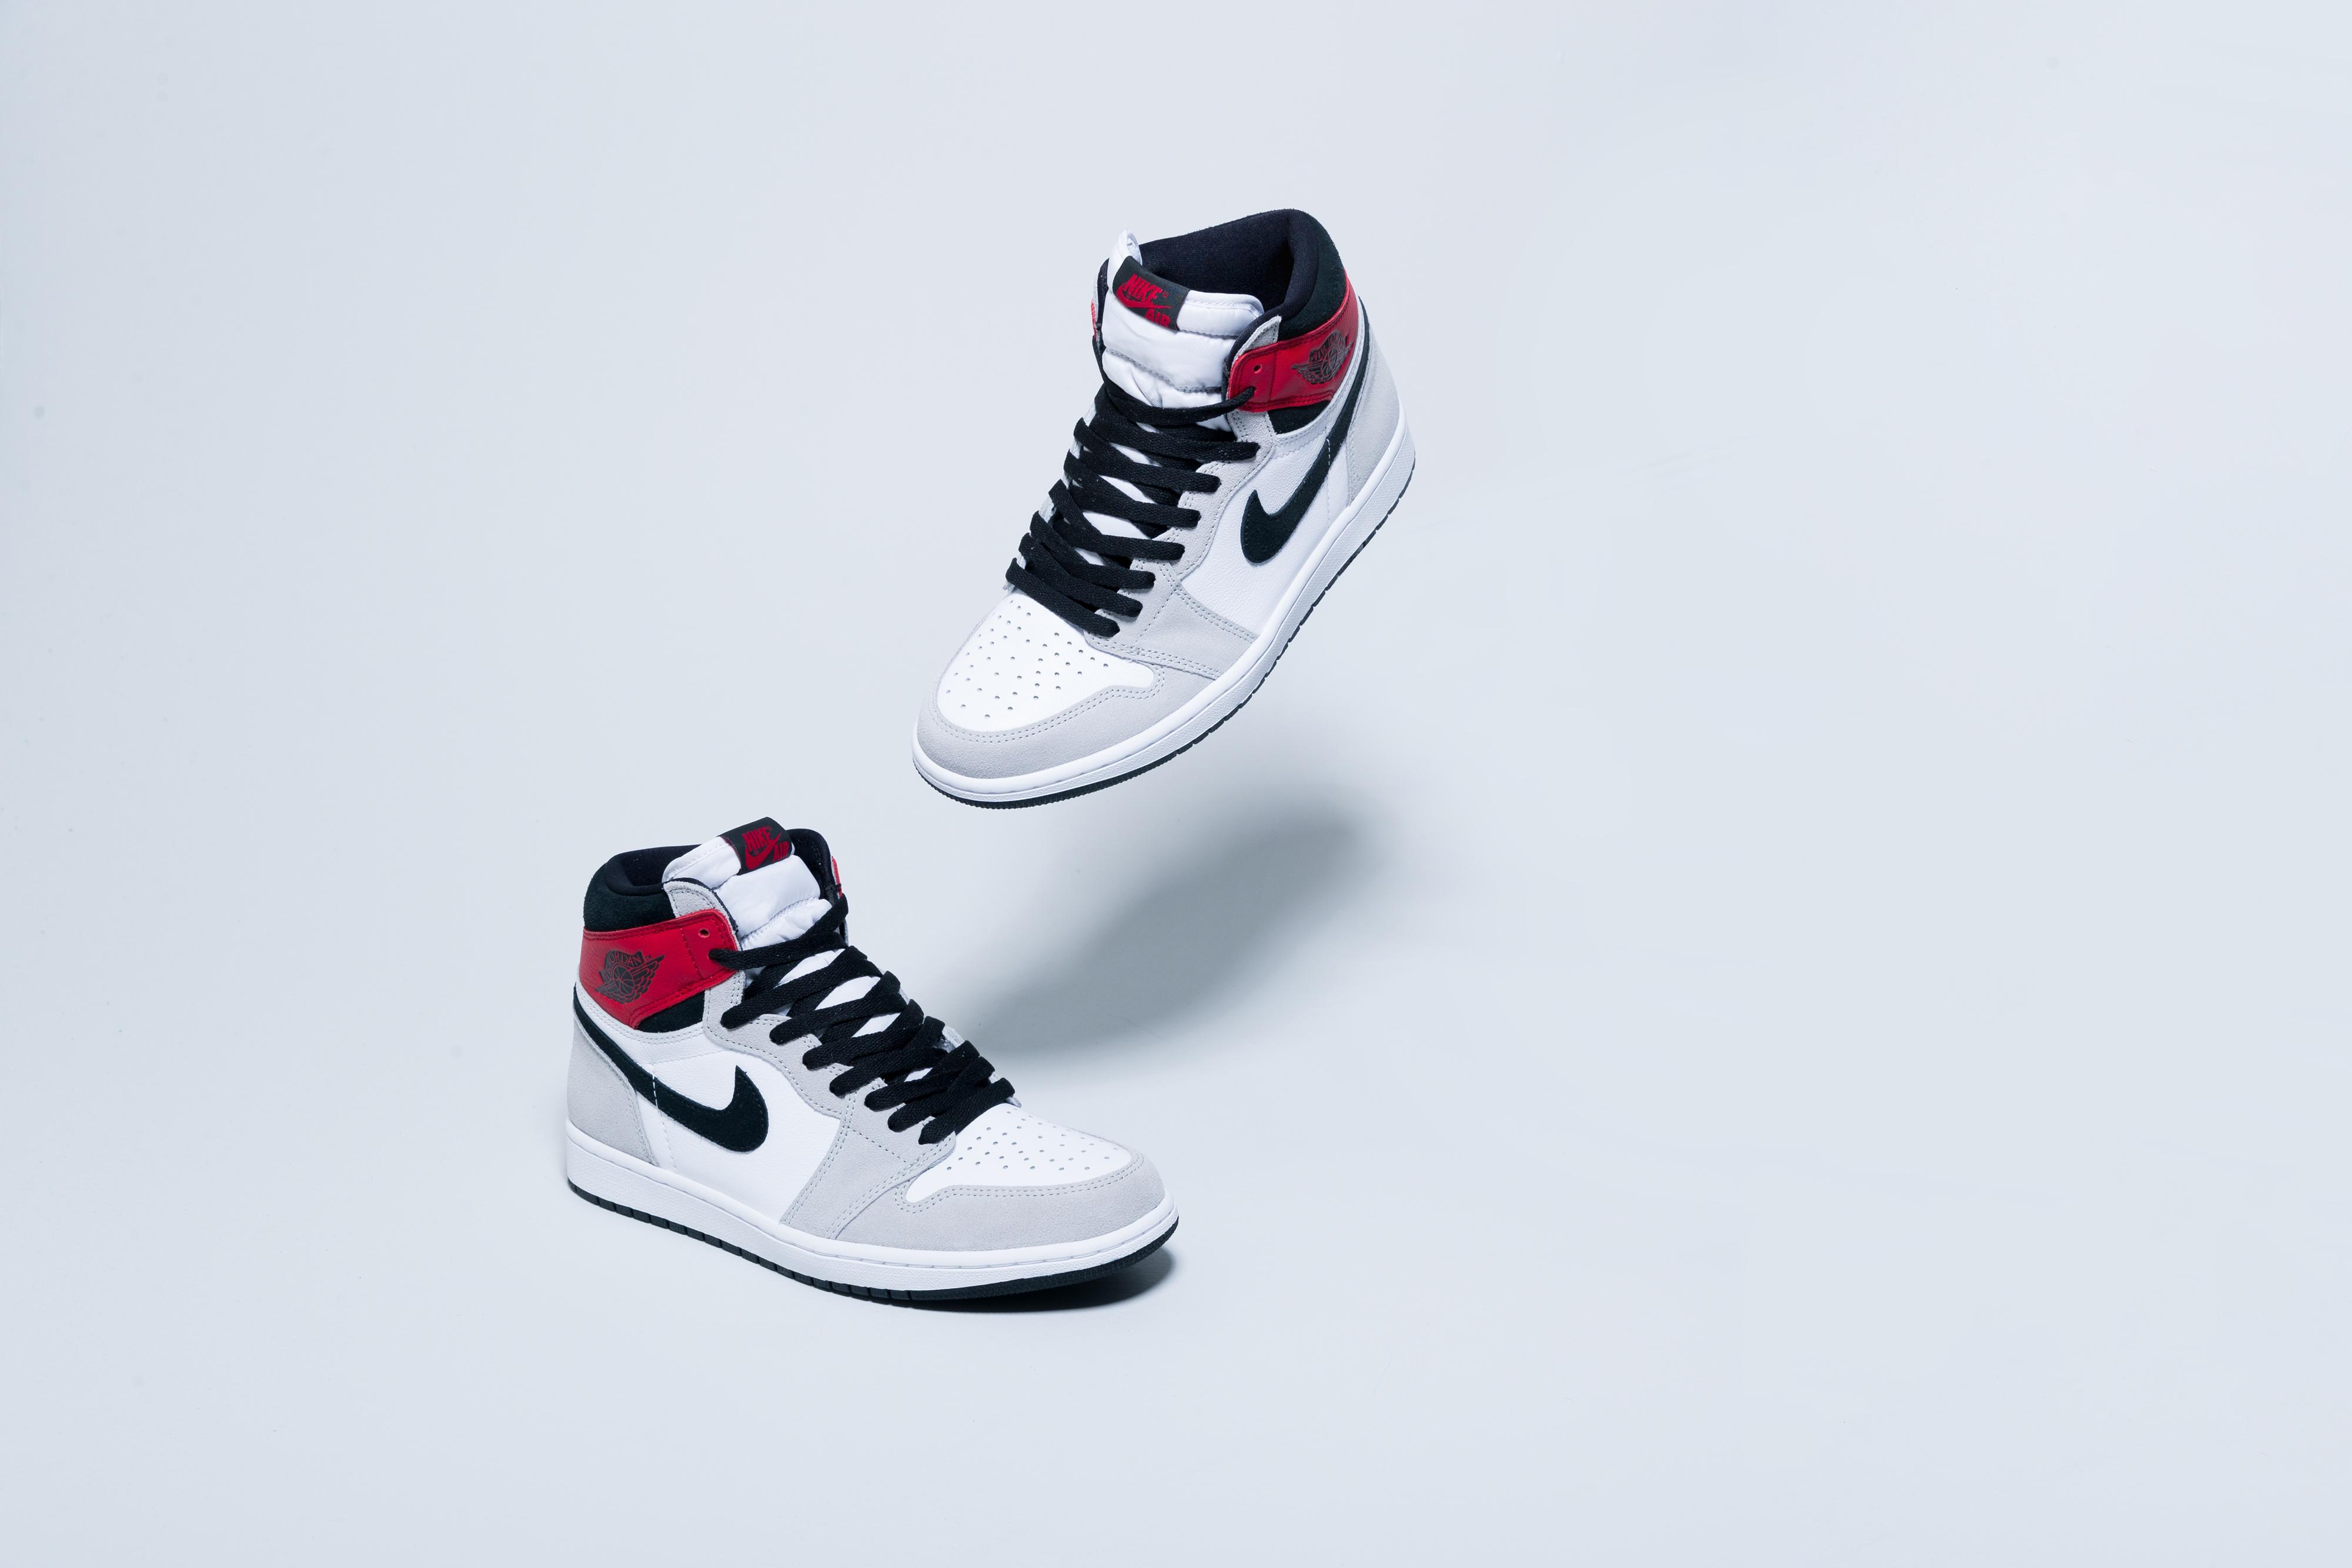 Jordan - Air Jordan 1 Retro Hi OG - White/Black-Light Smoke Grey-Varsity Red - Up There